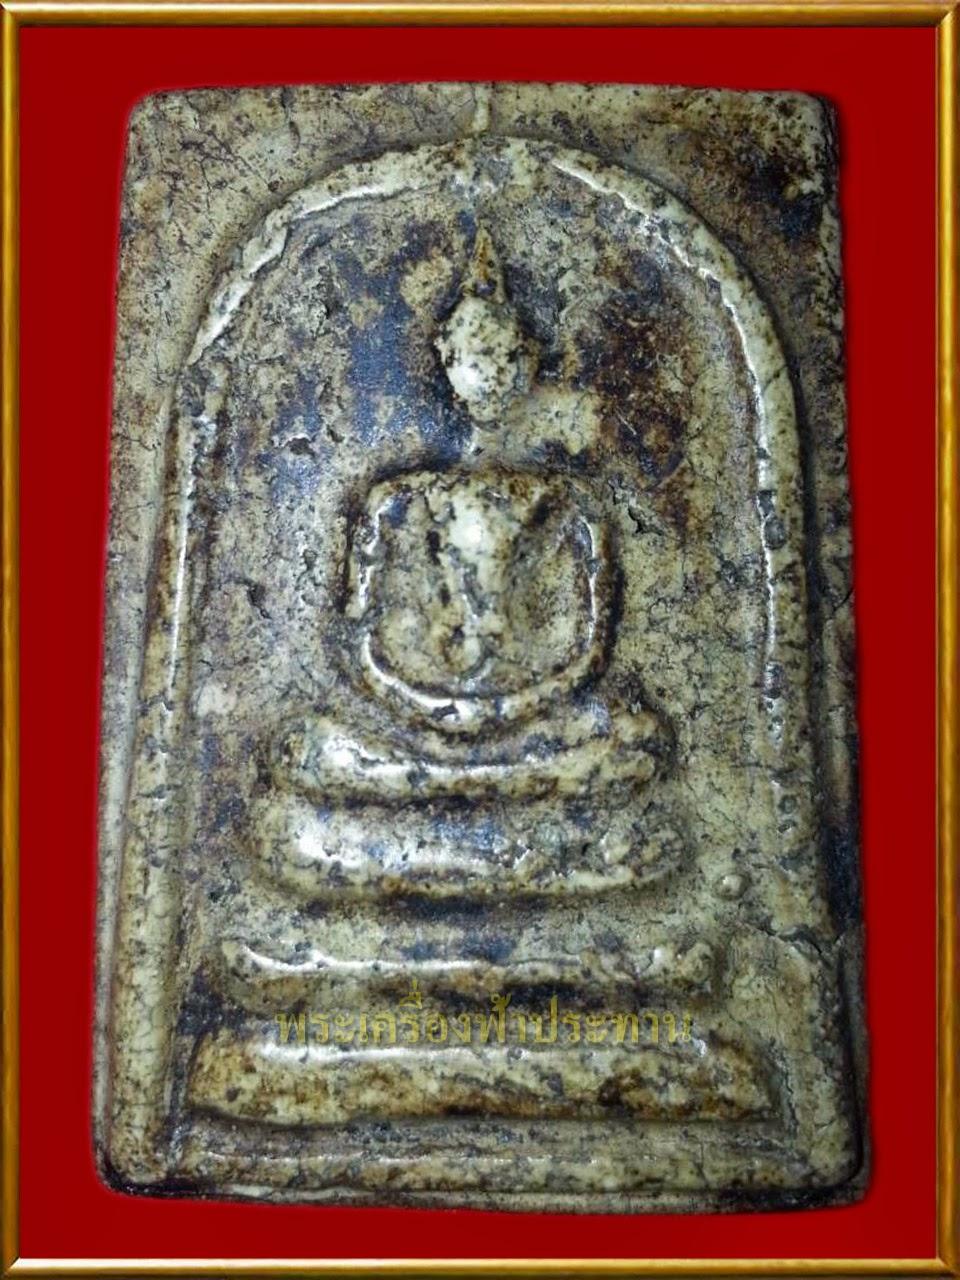 http://tubtimthong-amulet.blogspot.com/2014/11/blog-post_35.html